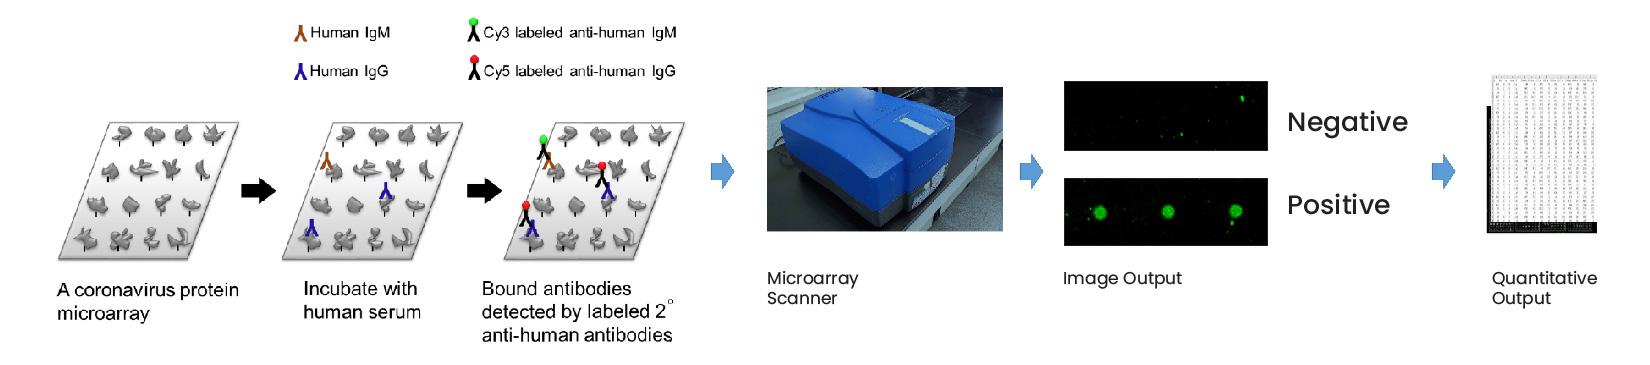 SMI-Microarray-Analysis-Method-for-Antibodies-CDI-Labs-SARS-MERS-INFLUENZA